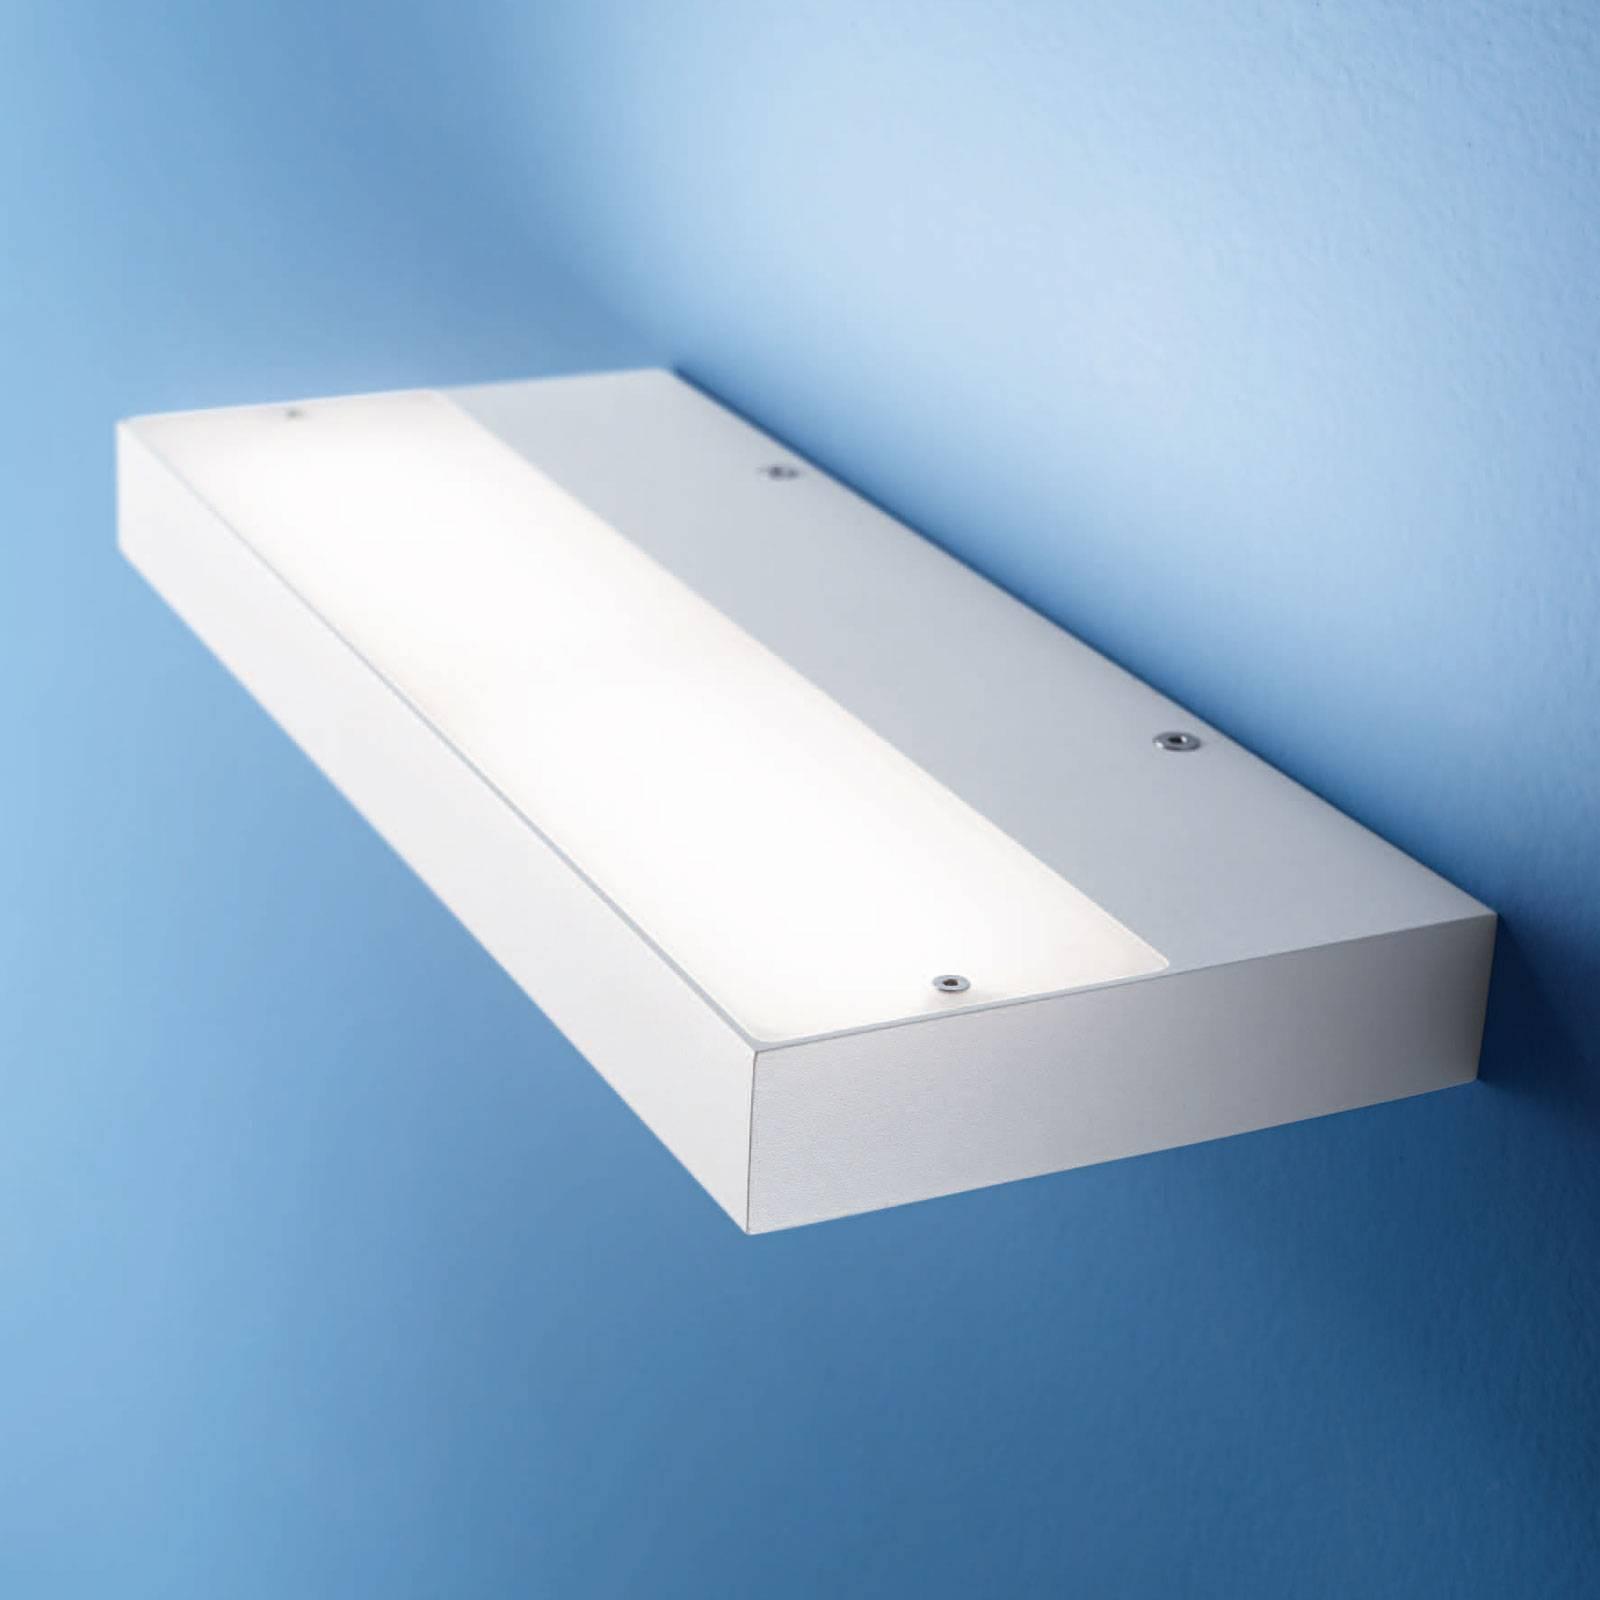 LED-Wandleuchte Regolo, Länge 24 cm, weiß